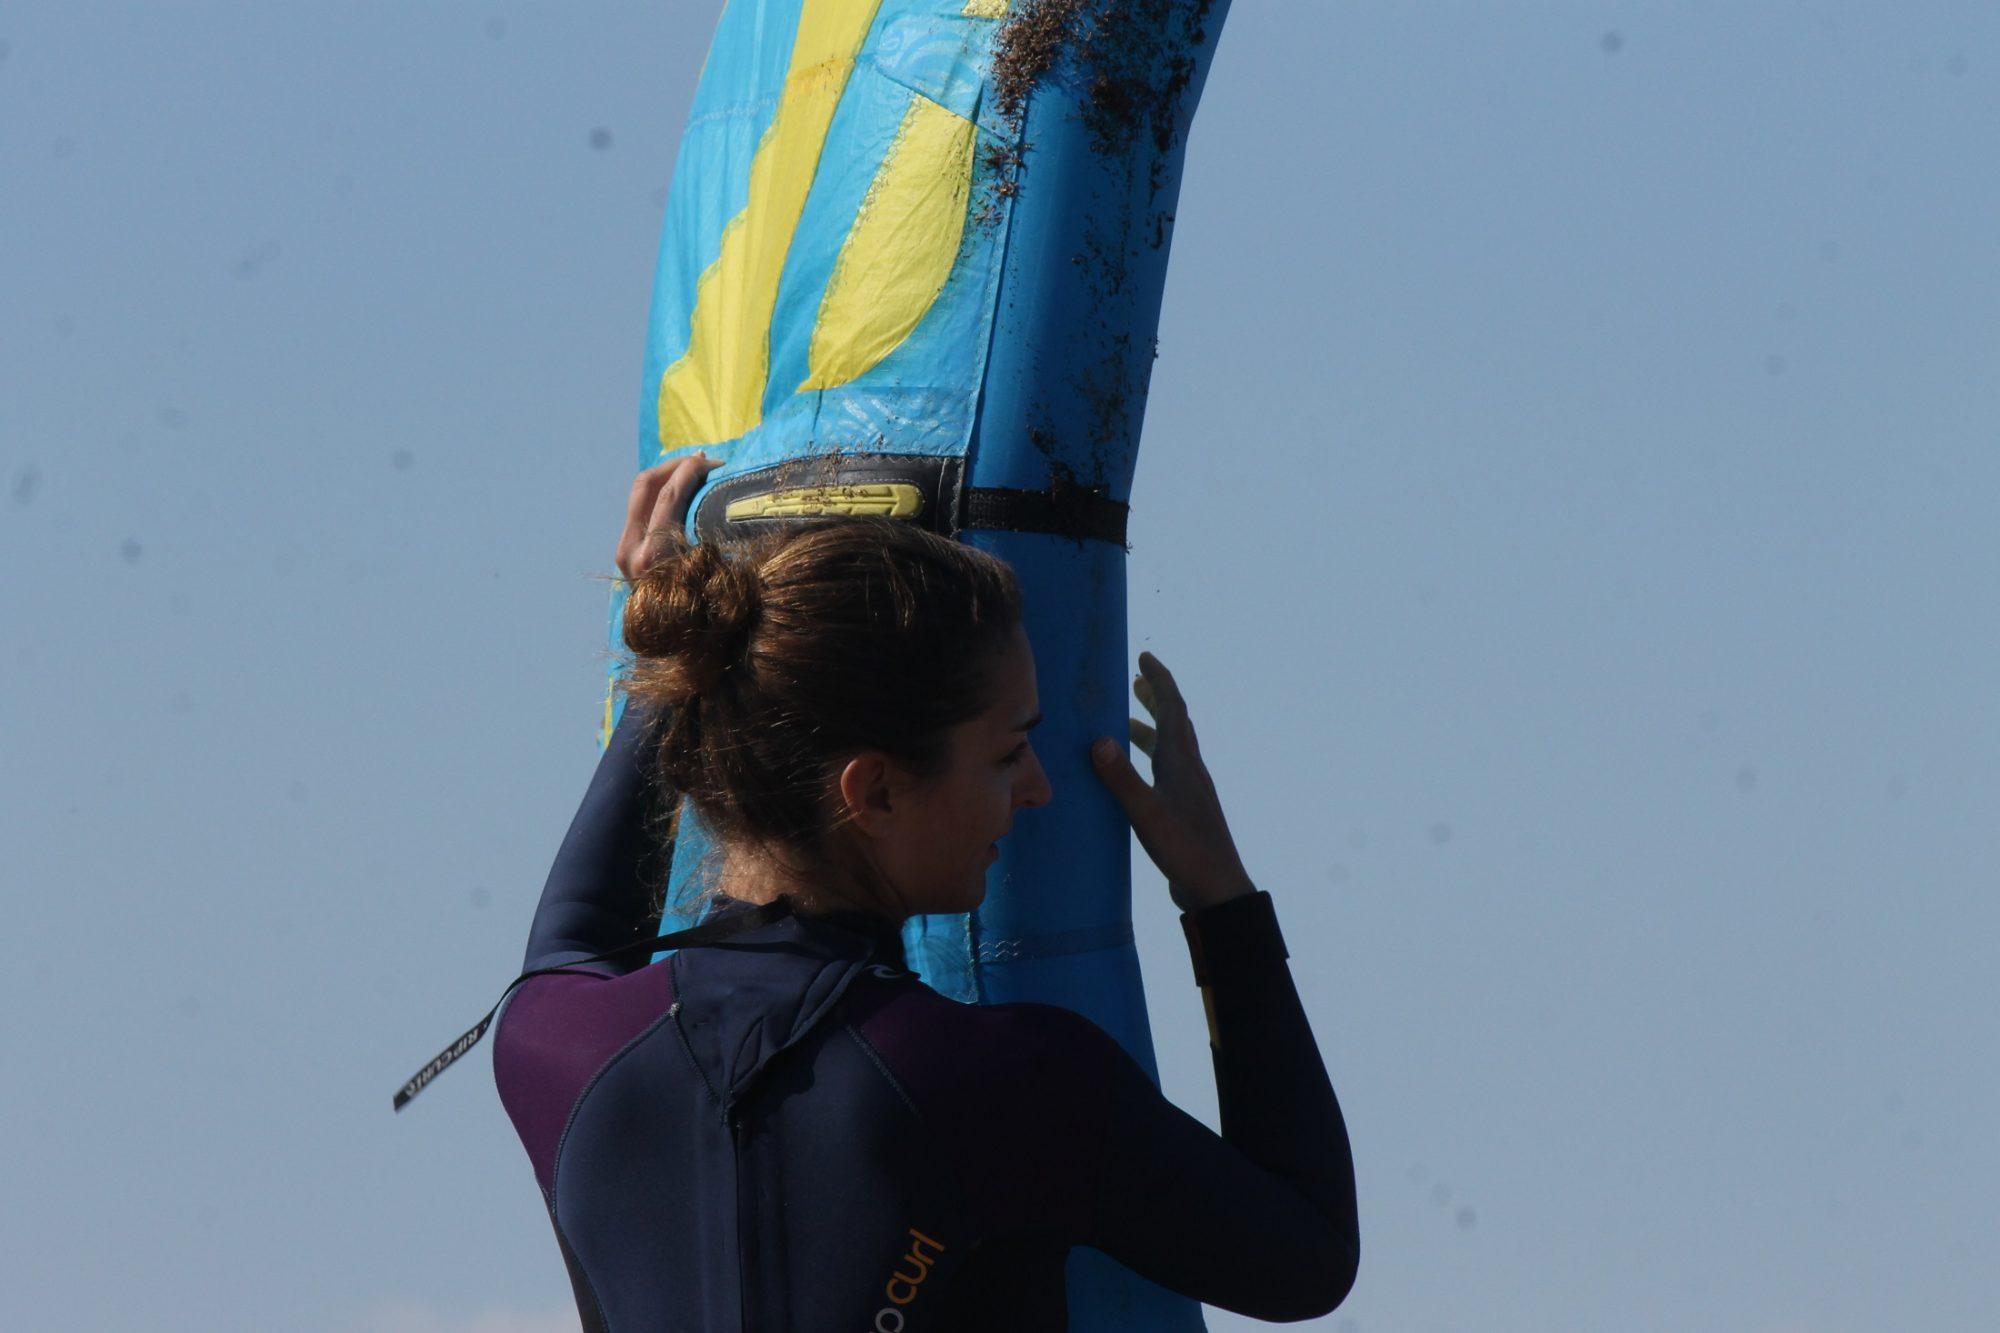 Mini KiteKurs in Sardinien: Kiten Lernen auf Sardinien